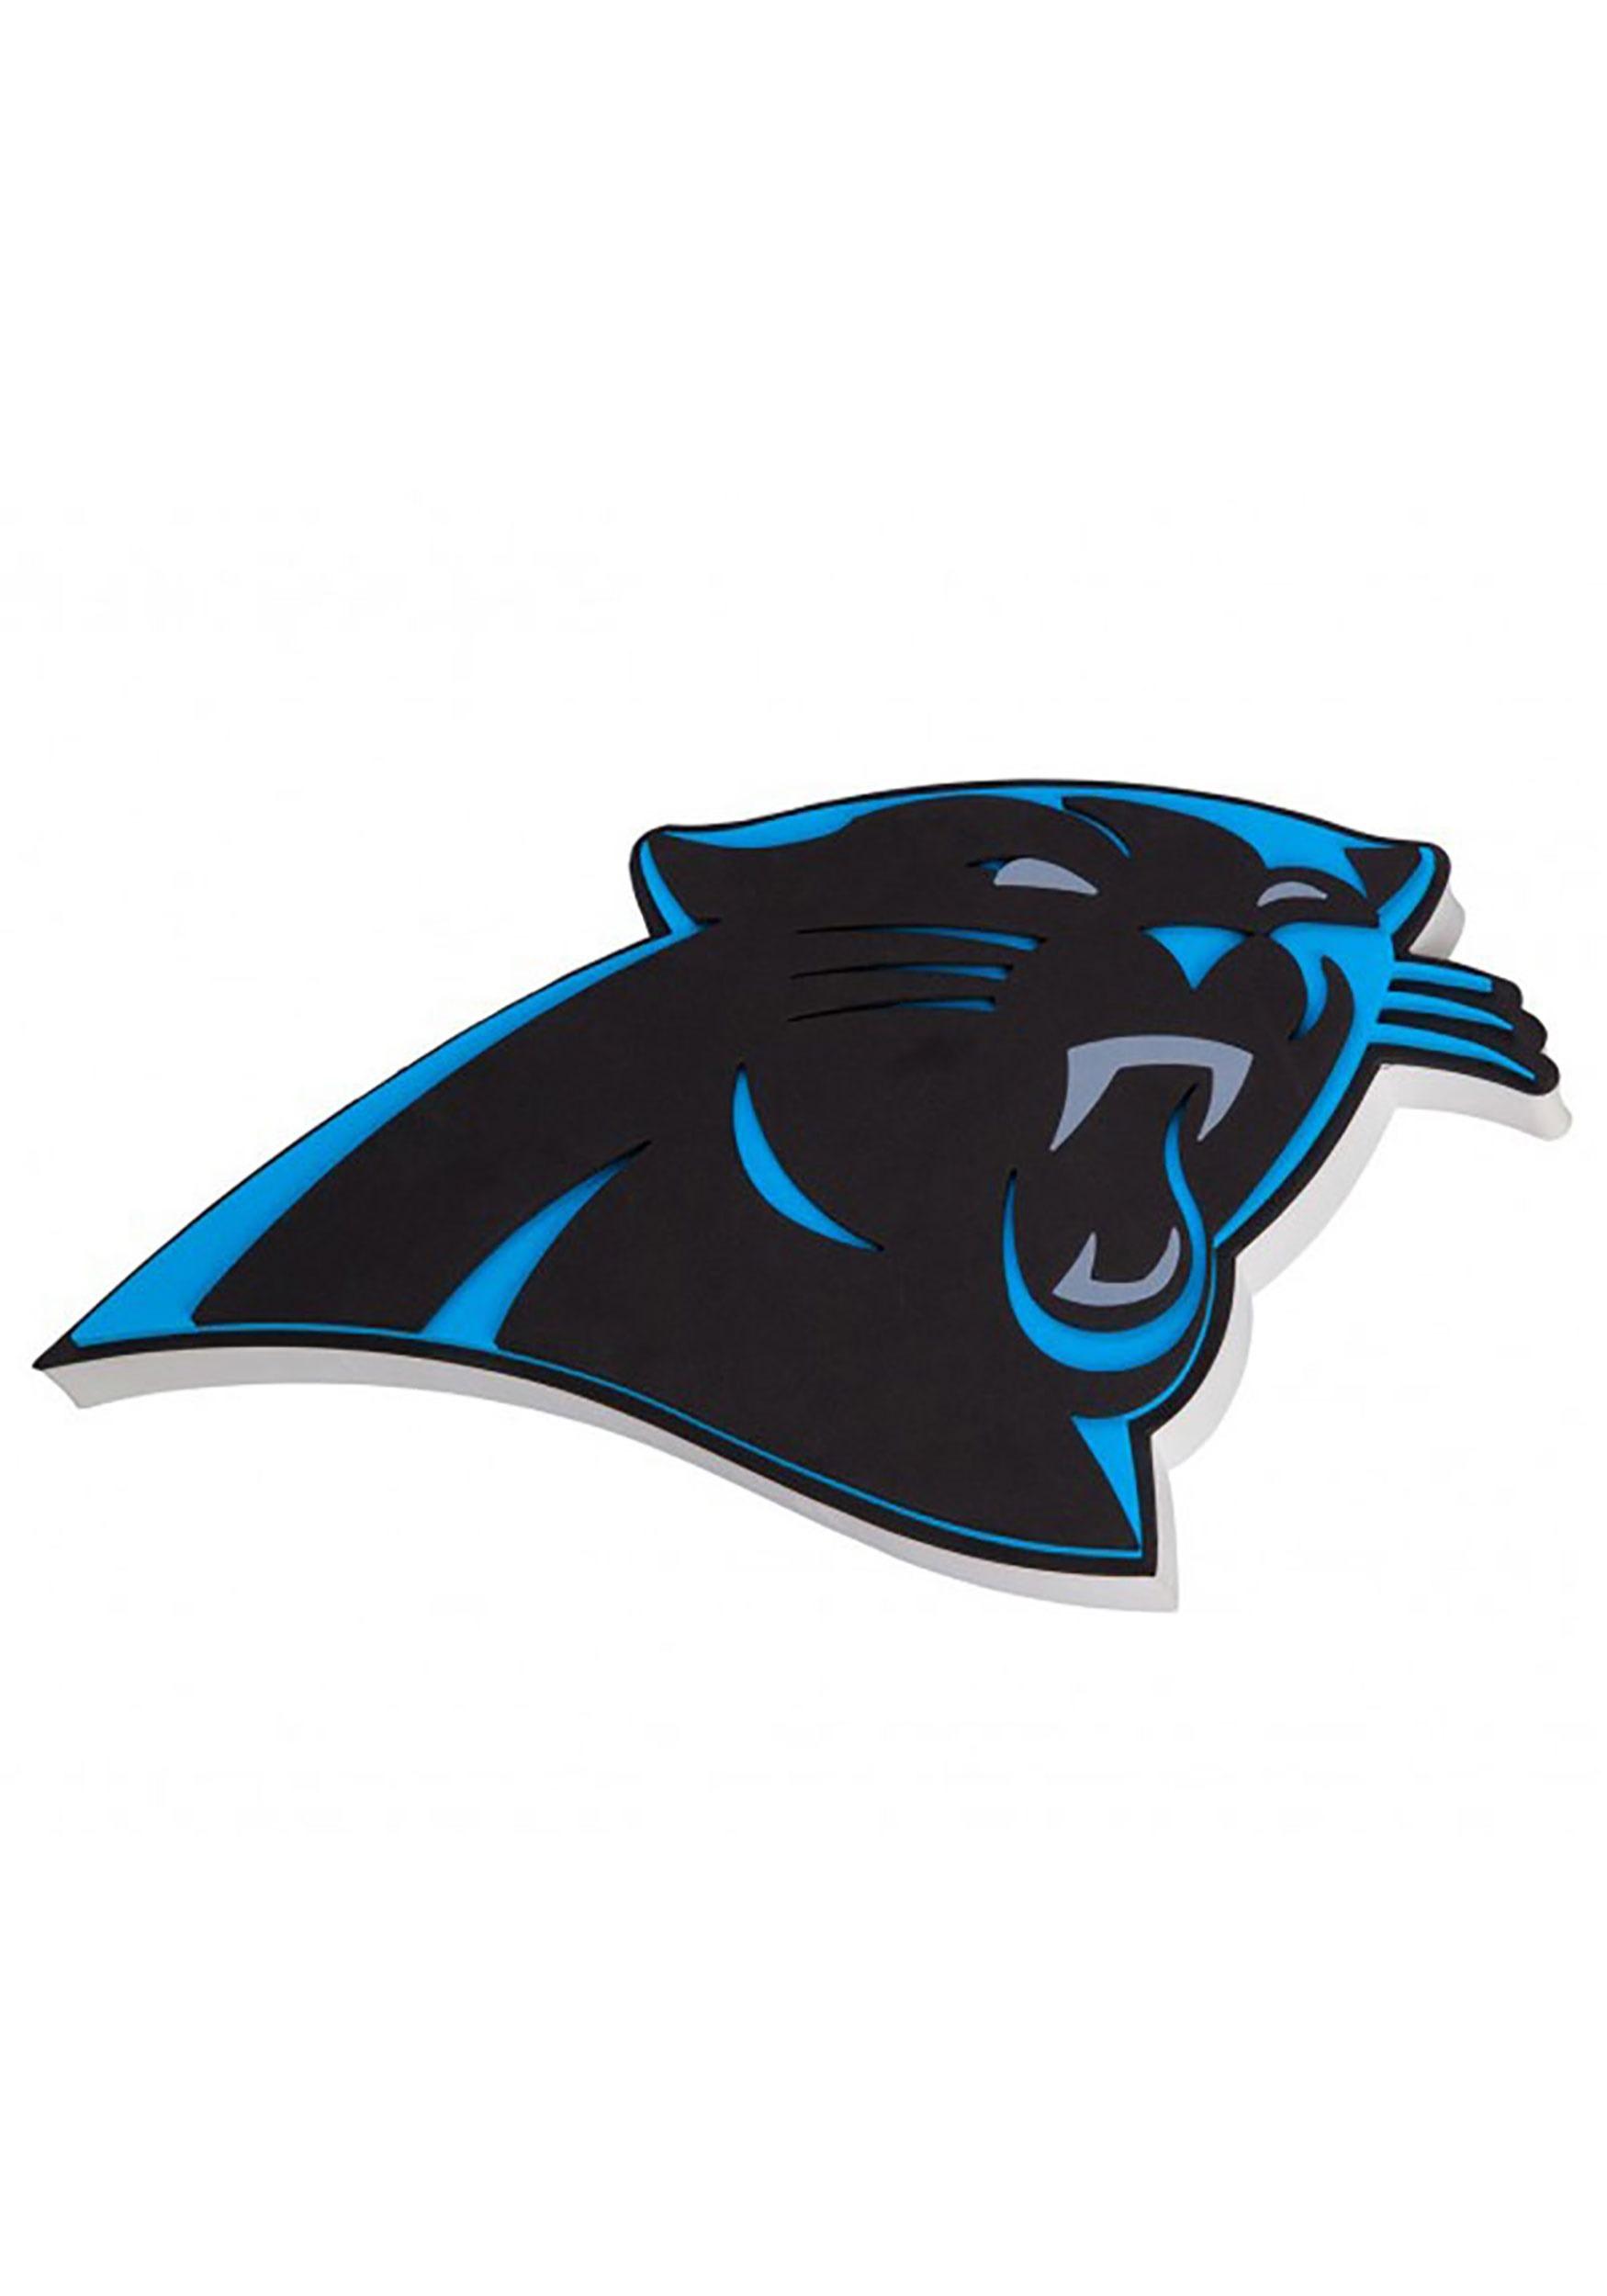 Carolina Panthers Nfl Logo Foam Sign